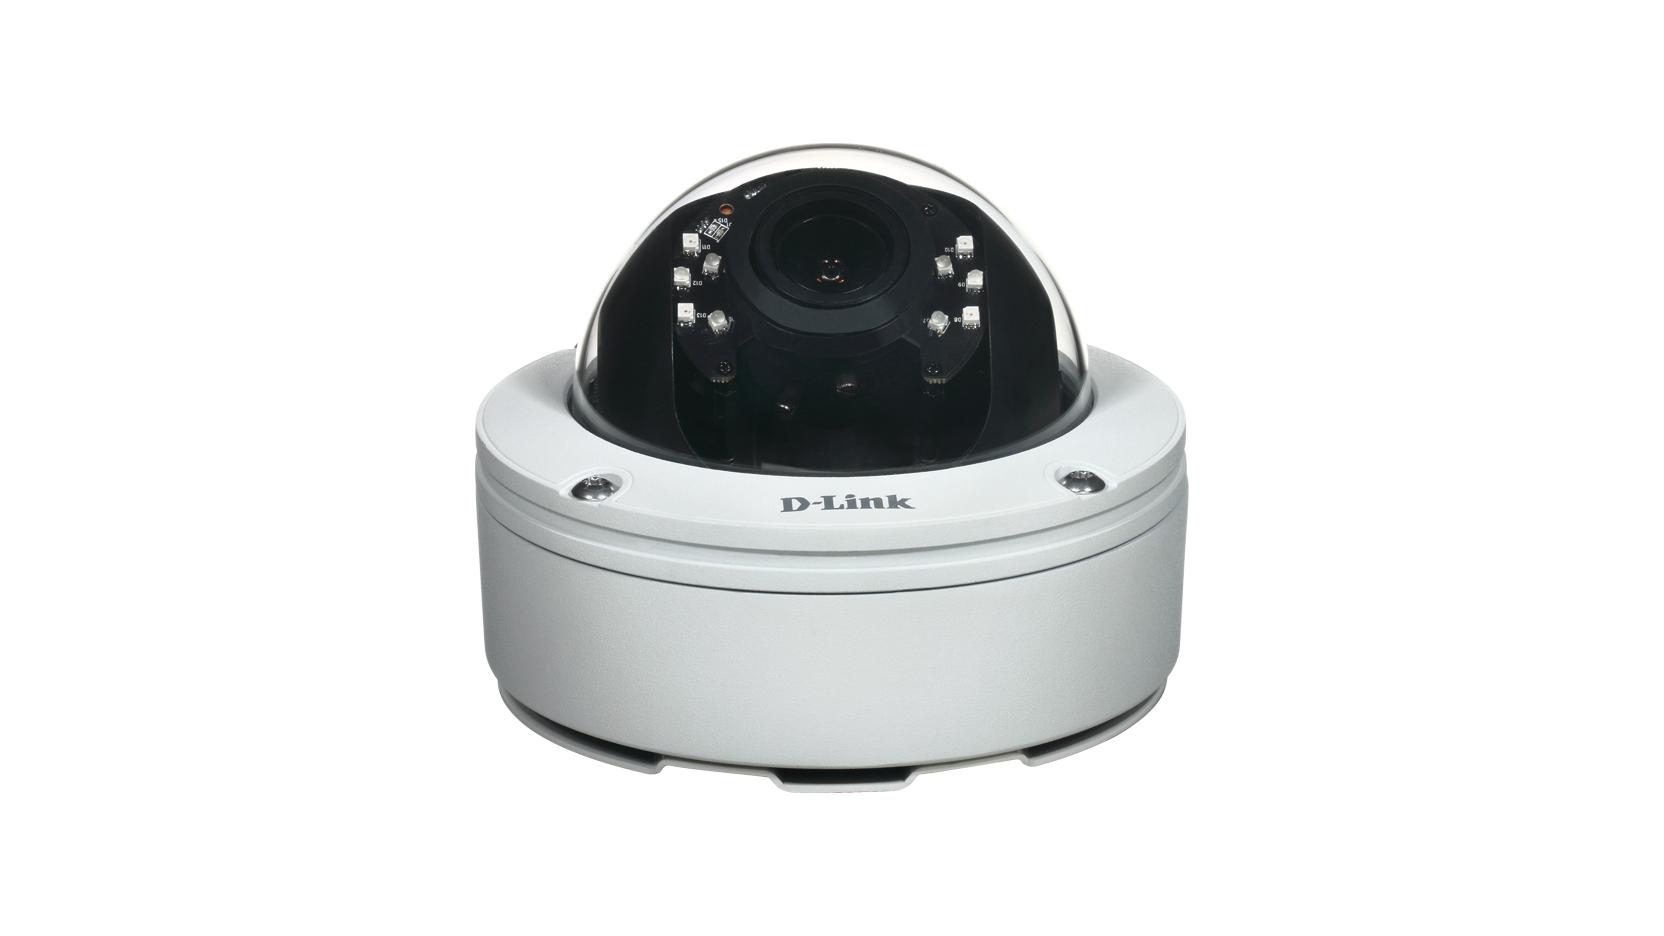 D-Link DCS-6517 IP Outdoor Dome White surveillance camera